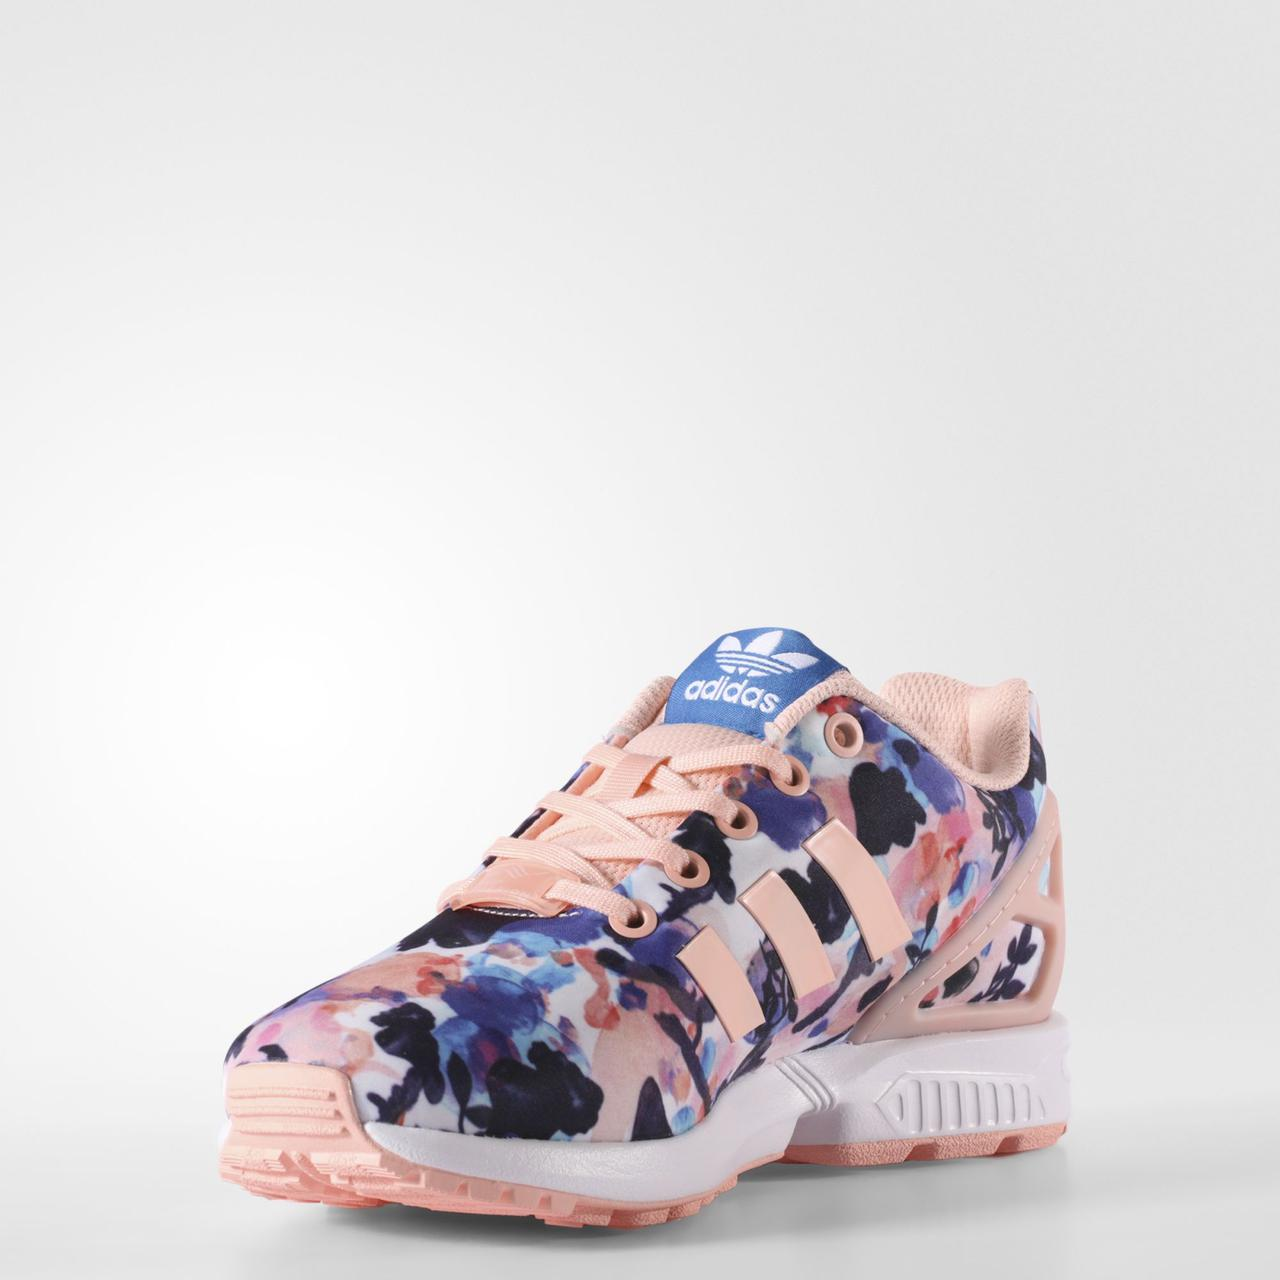 quality design 3af62 f5b26 Детские кроссовки Adidas Originals ZX Flux (Артикул: BB2879)